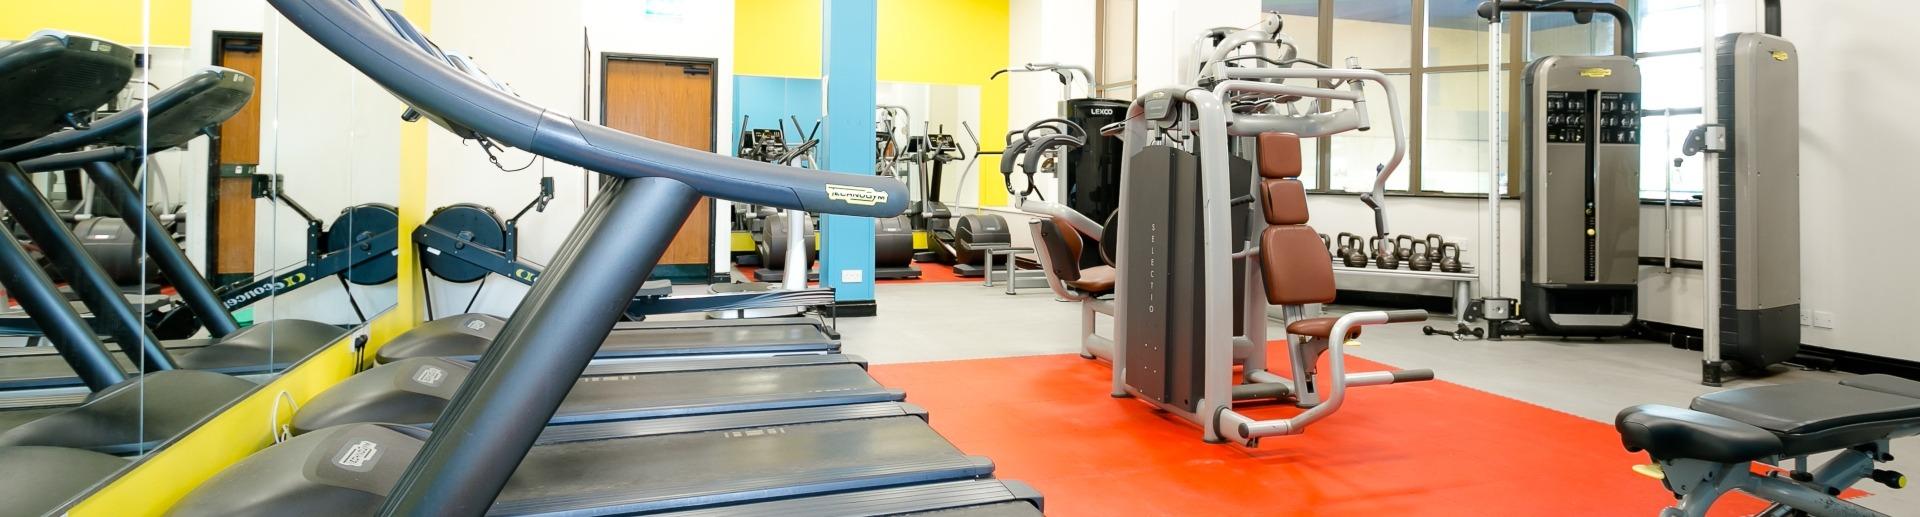 Cedar Court Hotels<br /> Health Club and Gyms